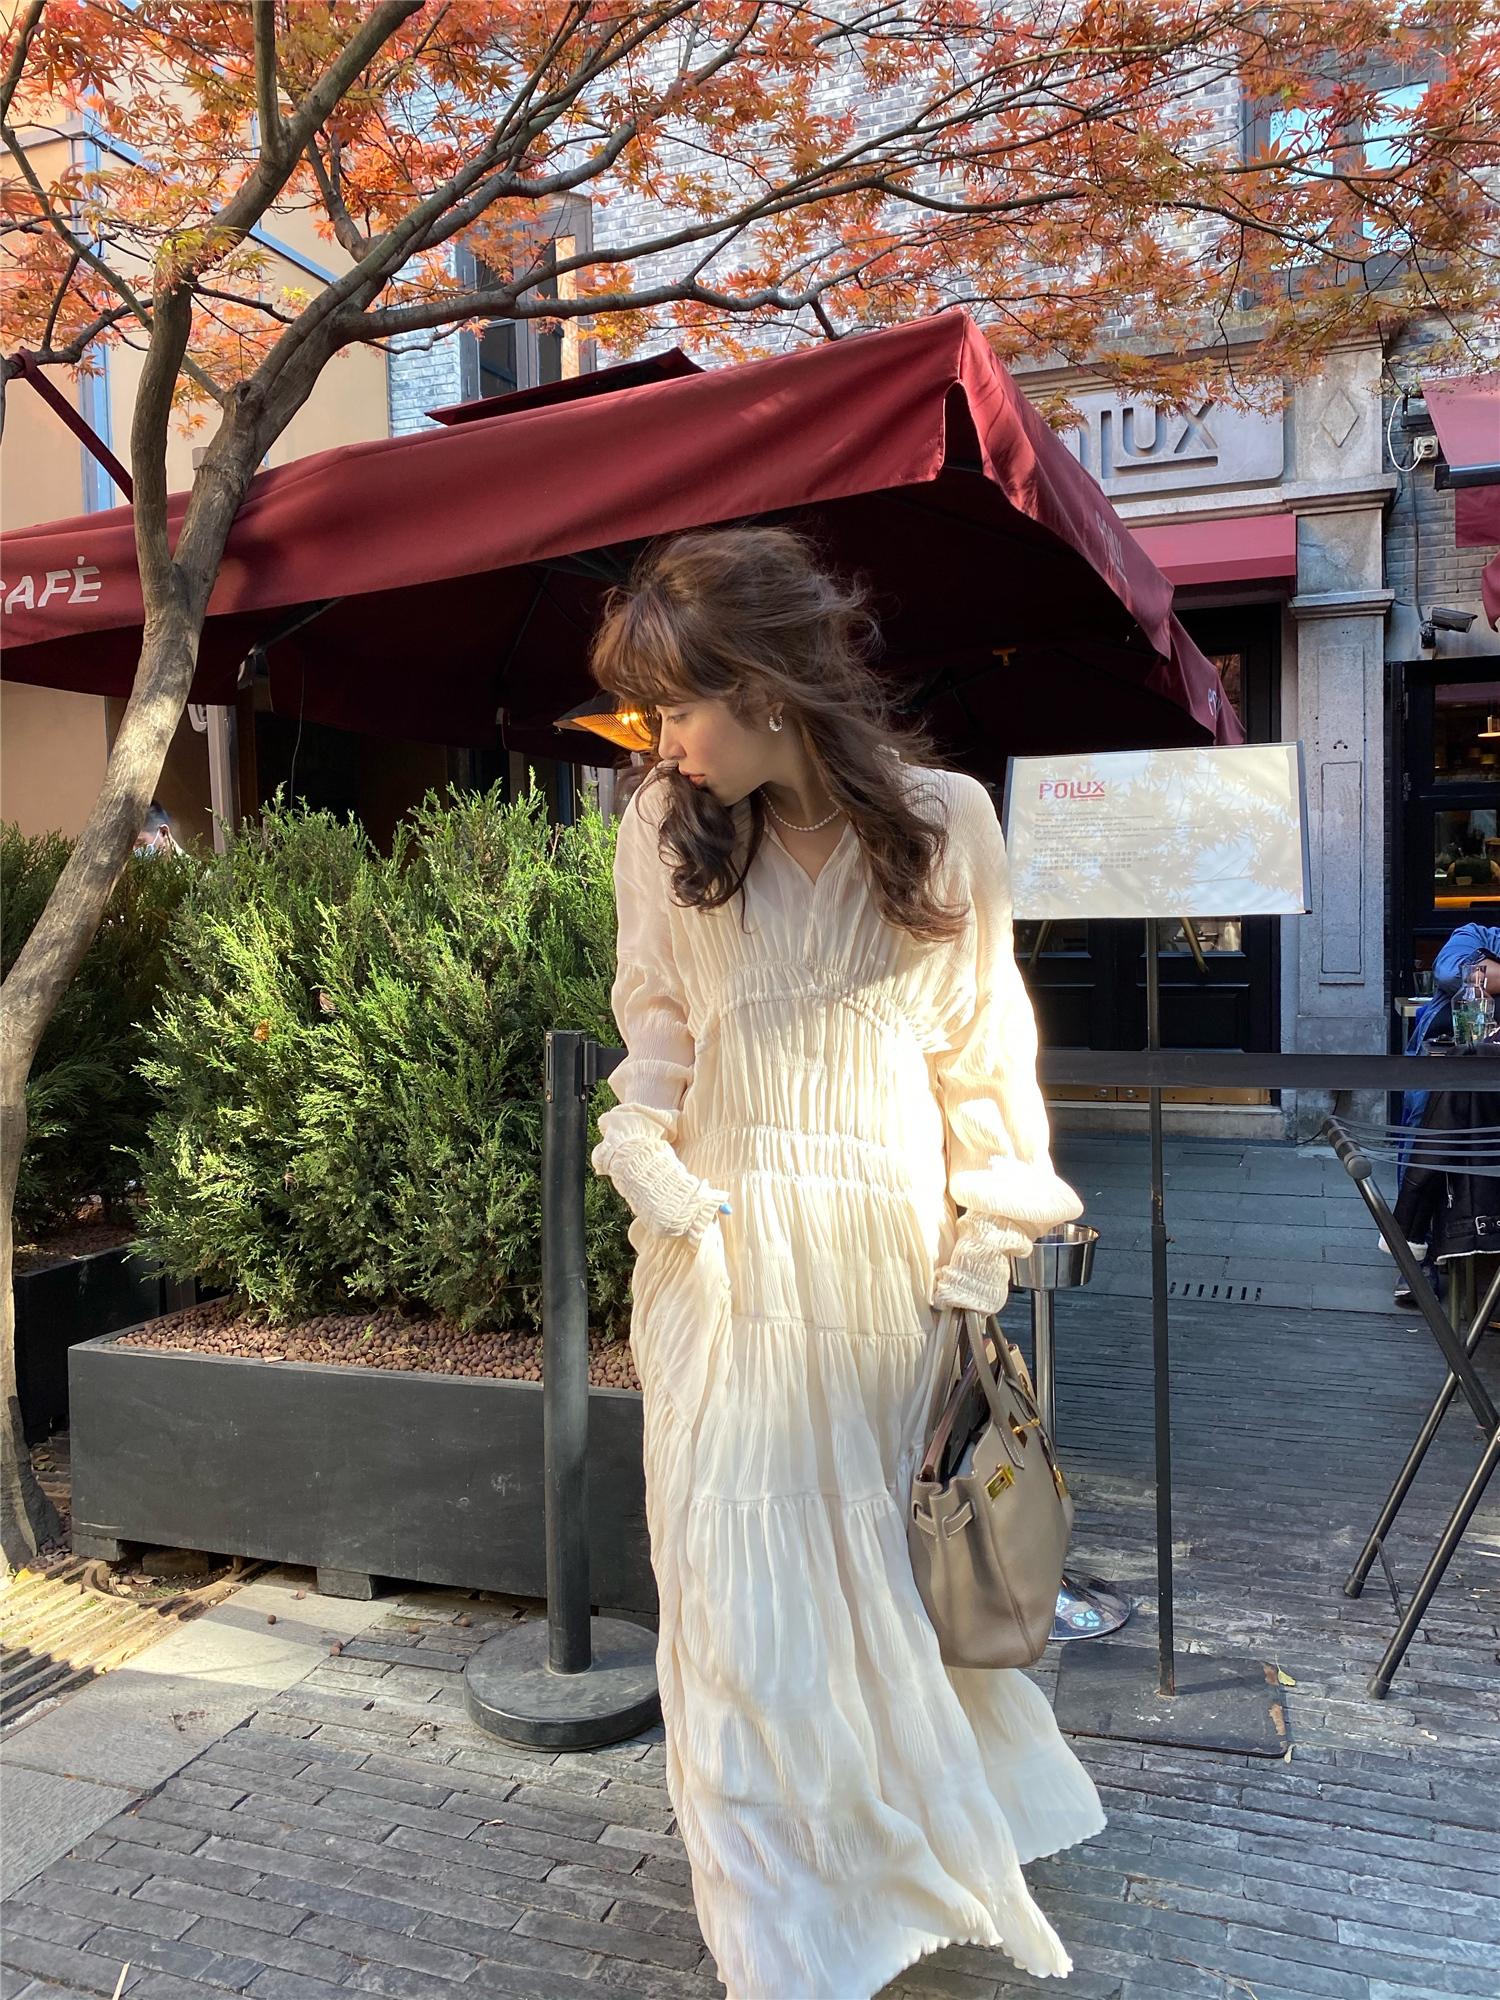 3ts 长袖甜美连衣裙2021新款夏季泫雅风气质长裙洋气显瘦雪纺裙子